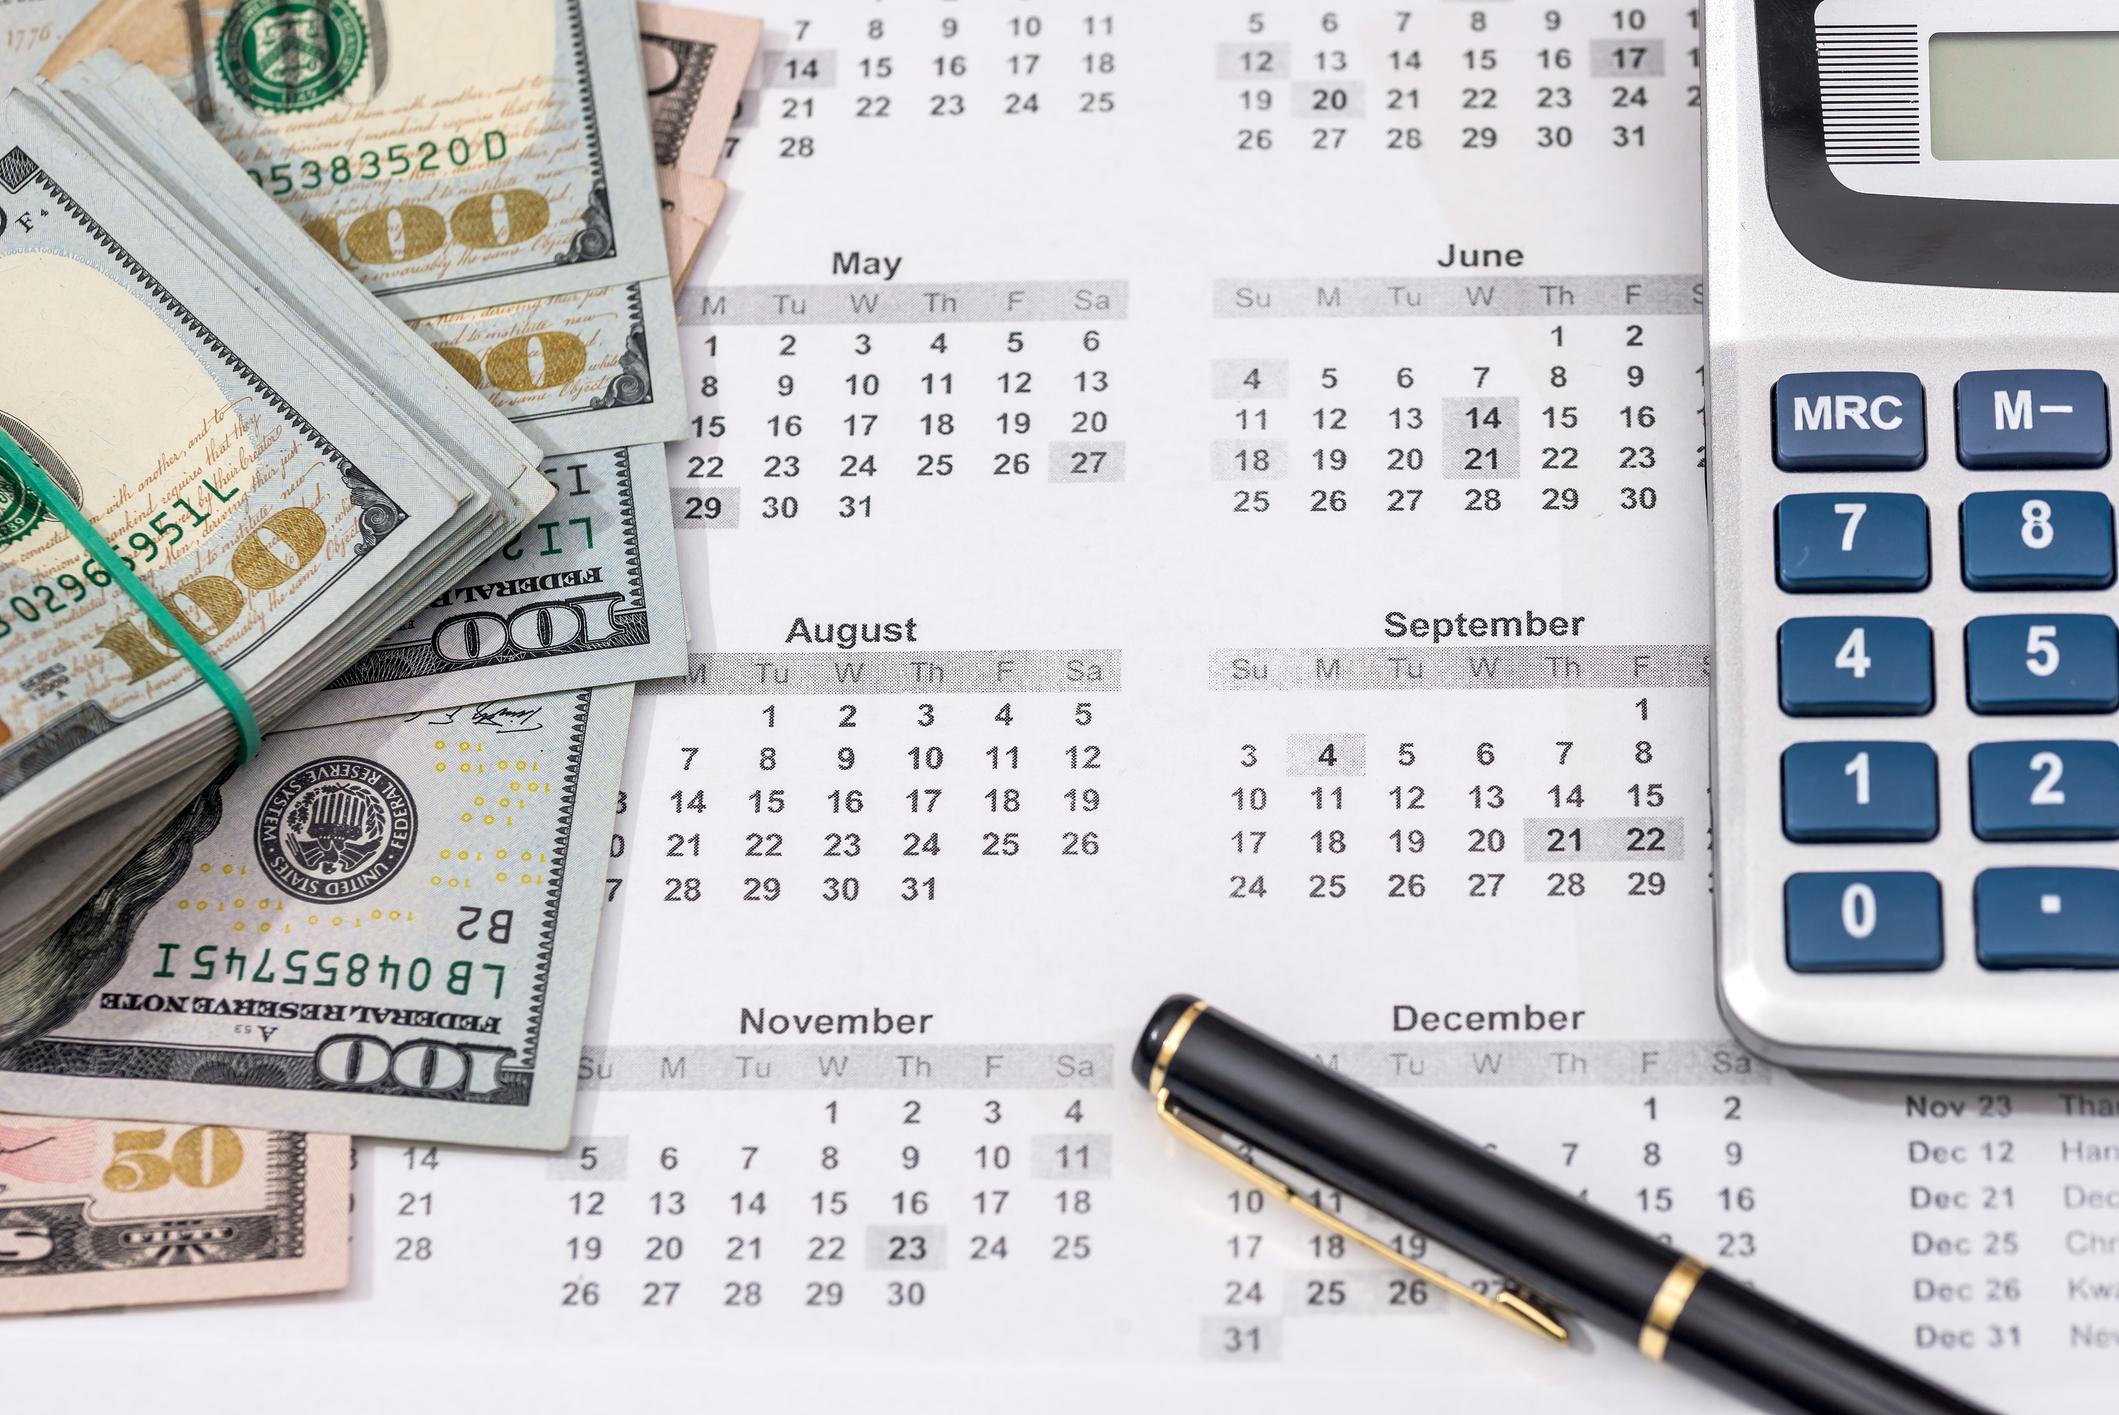 A desk calendar with a calculator, pen, and 100 dollar bills on it.